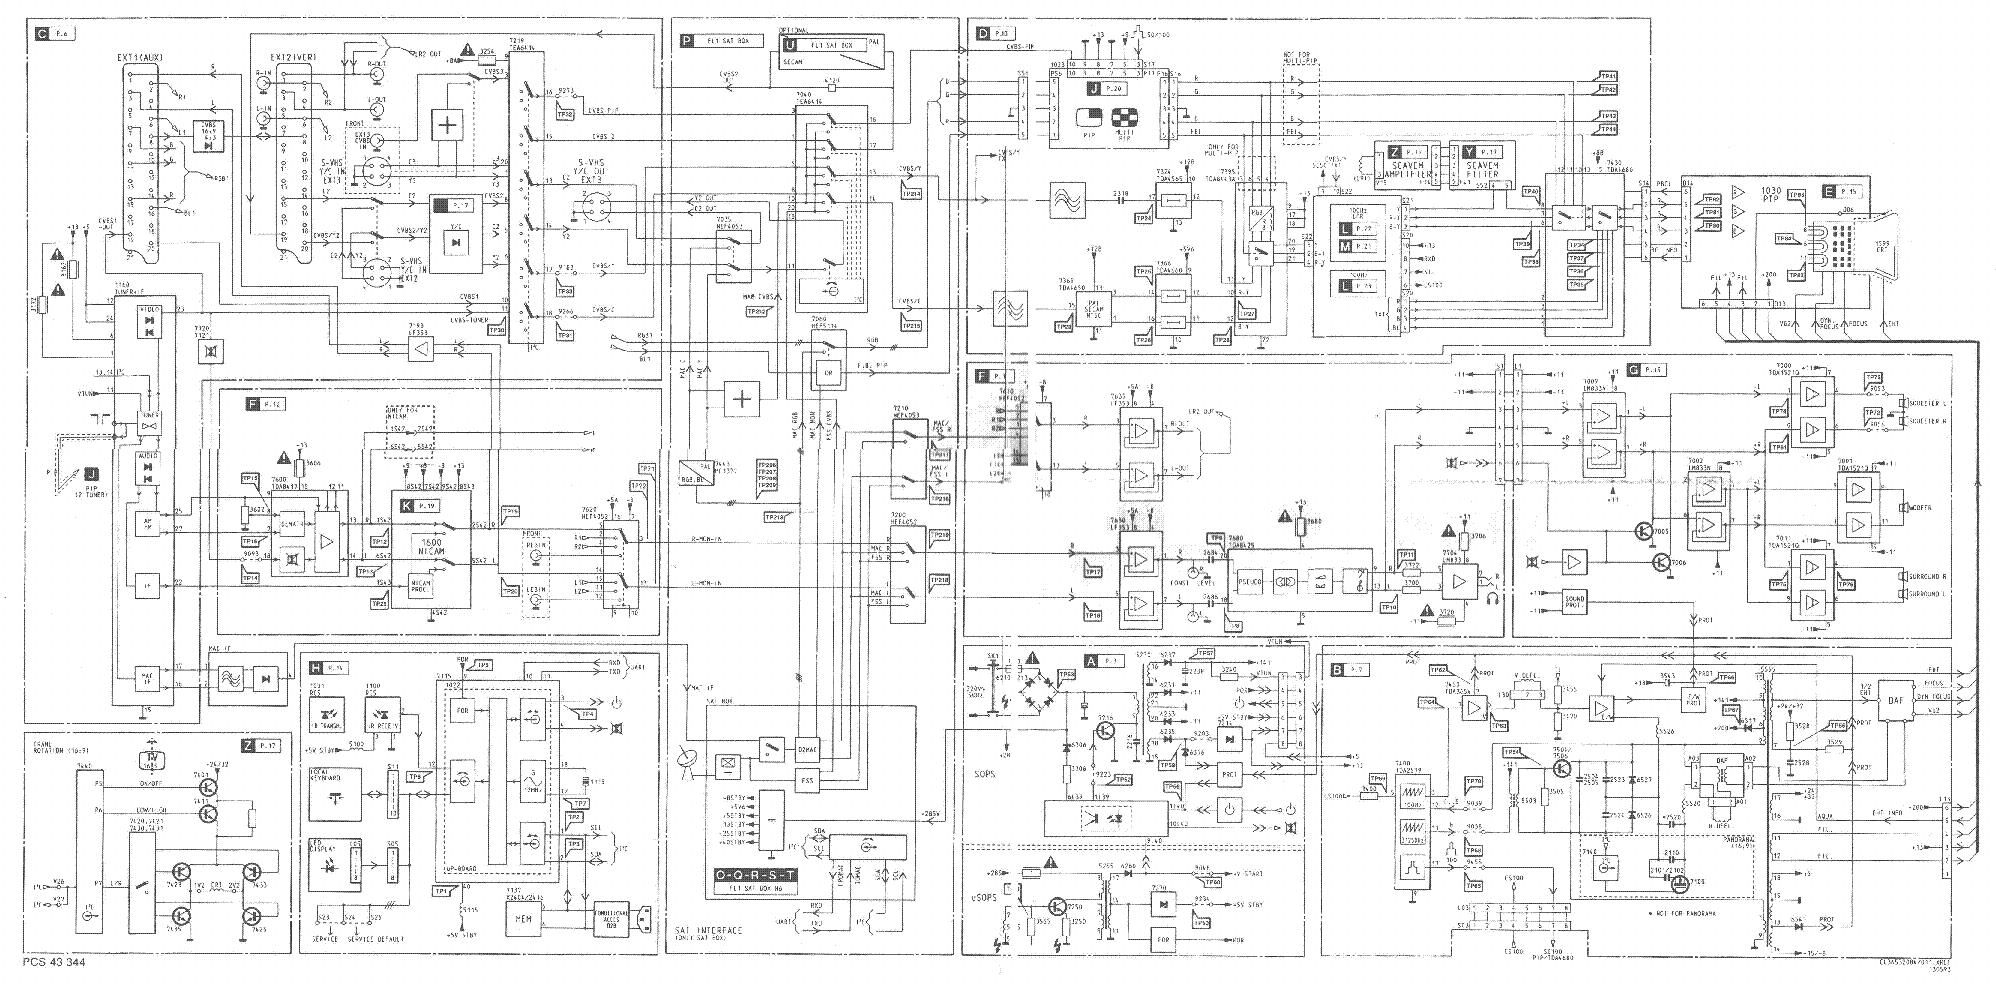 philips tv fl1 14 2 16 service manual download schematics eeprom rh elektrotanya com service manual philips 40pfl5706-f7 service manual philips led tv free download